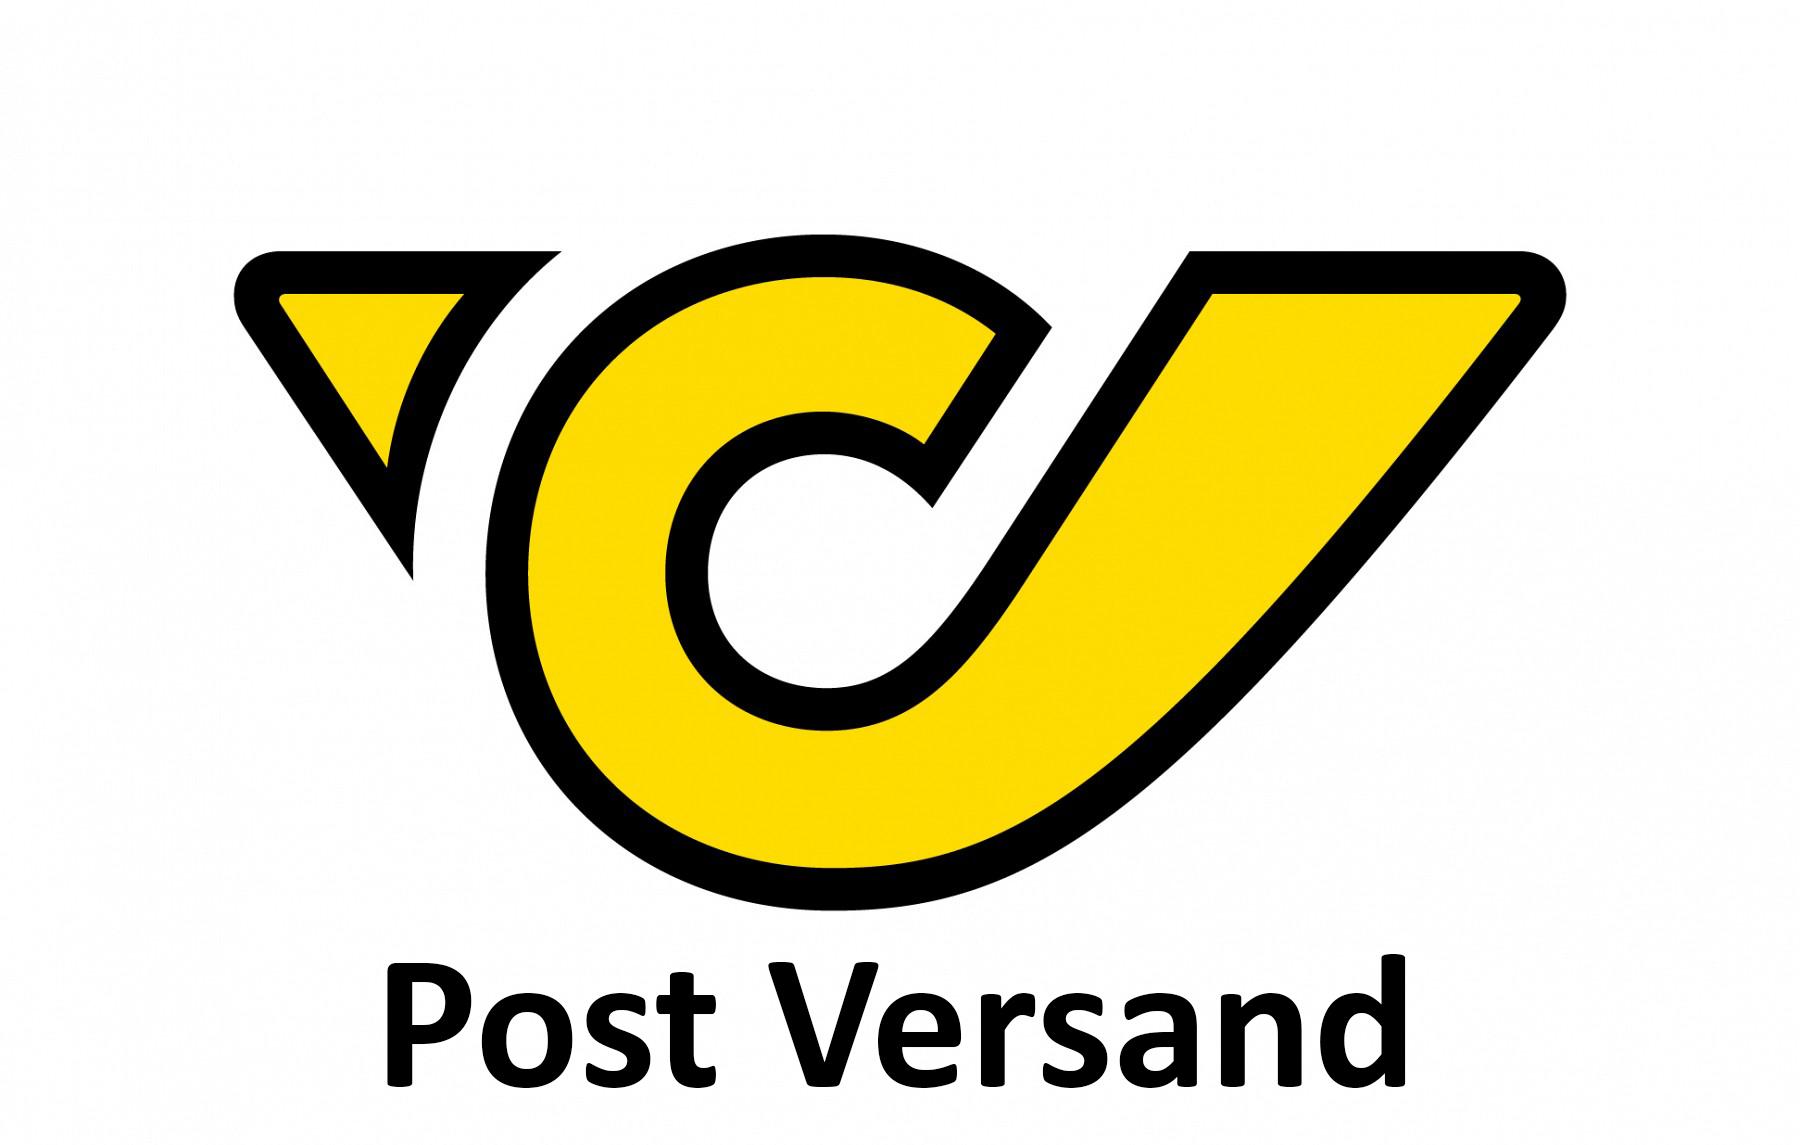 Post Versand